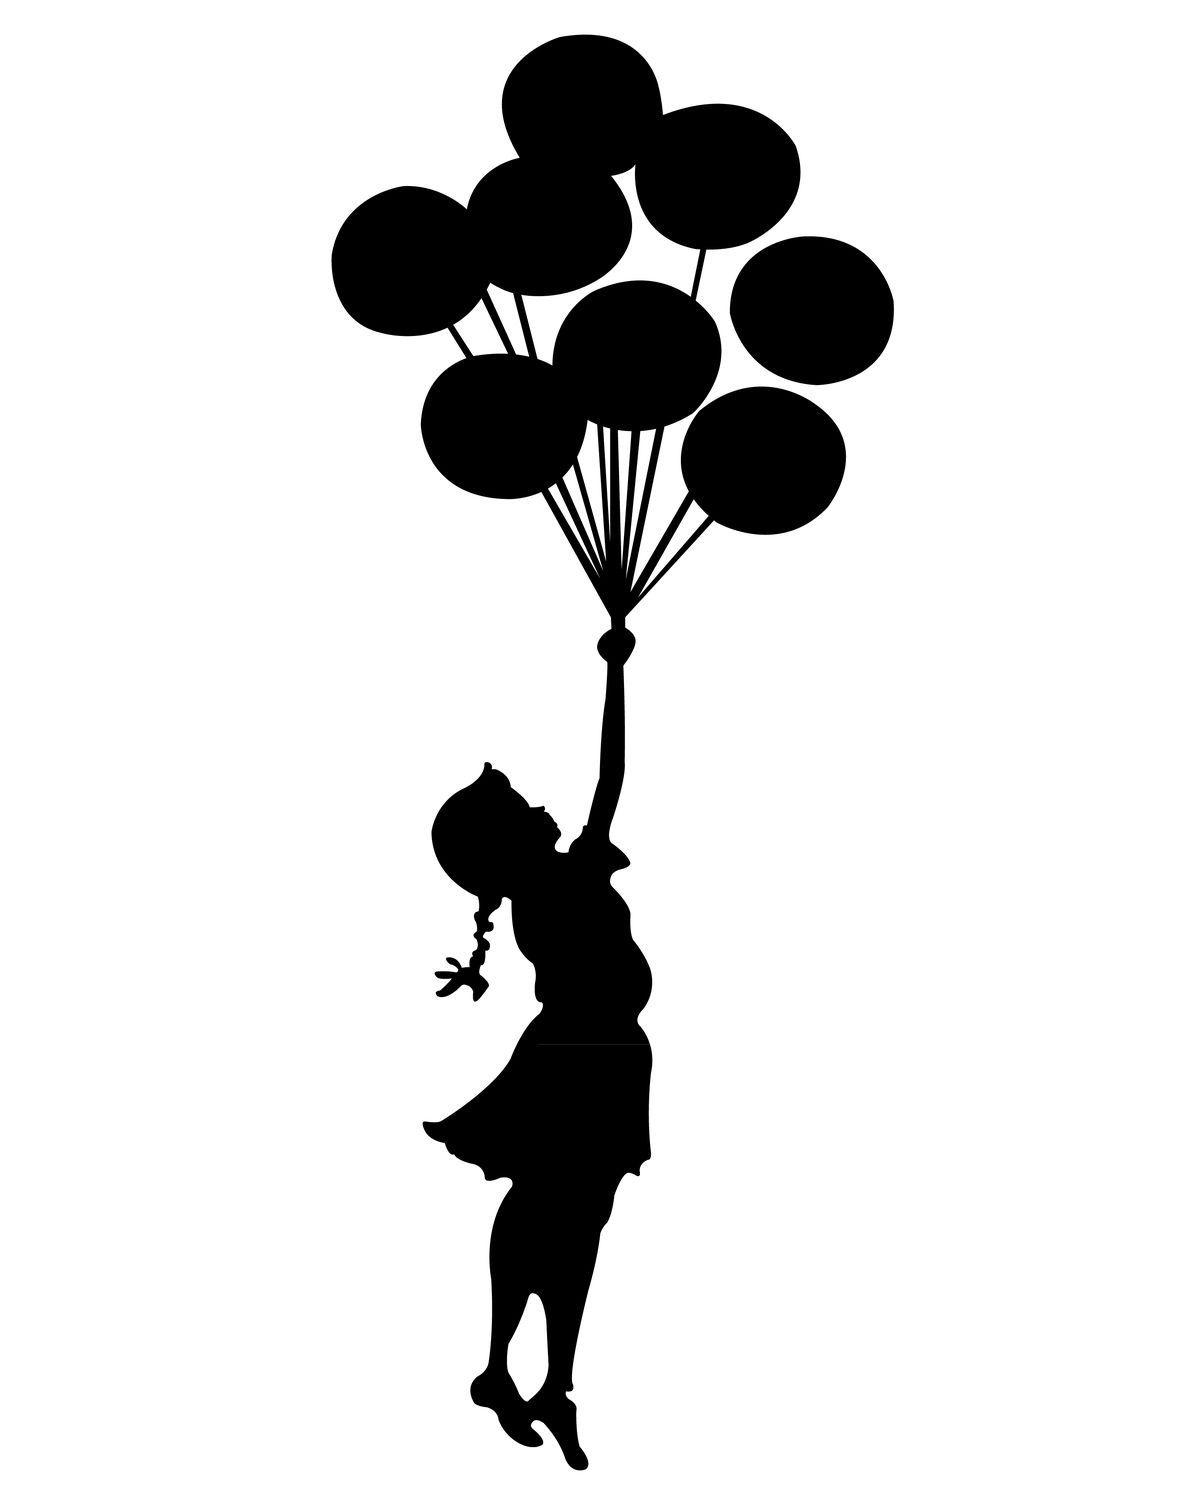 Pin by kaitlin sandberg. Balloon clipart silhouette